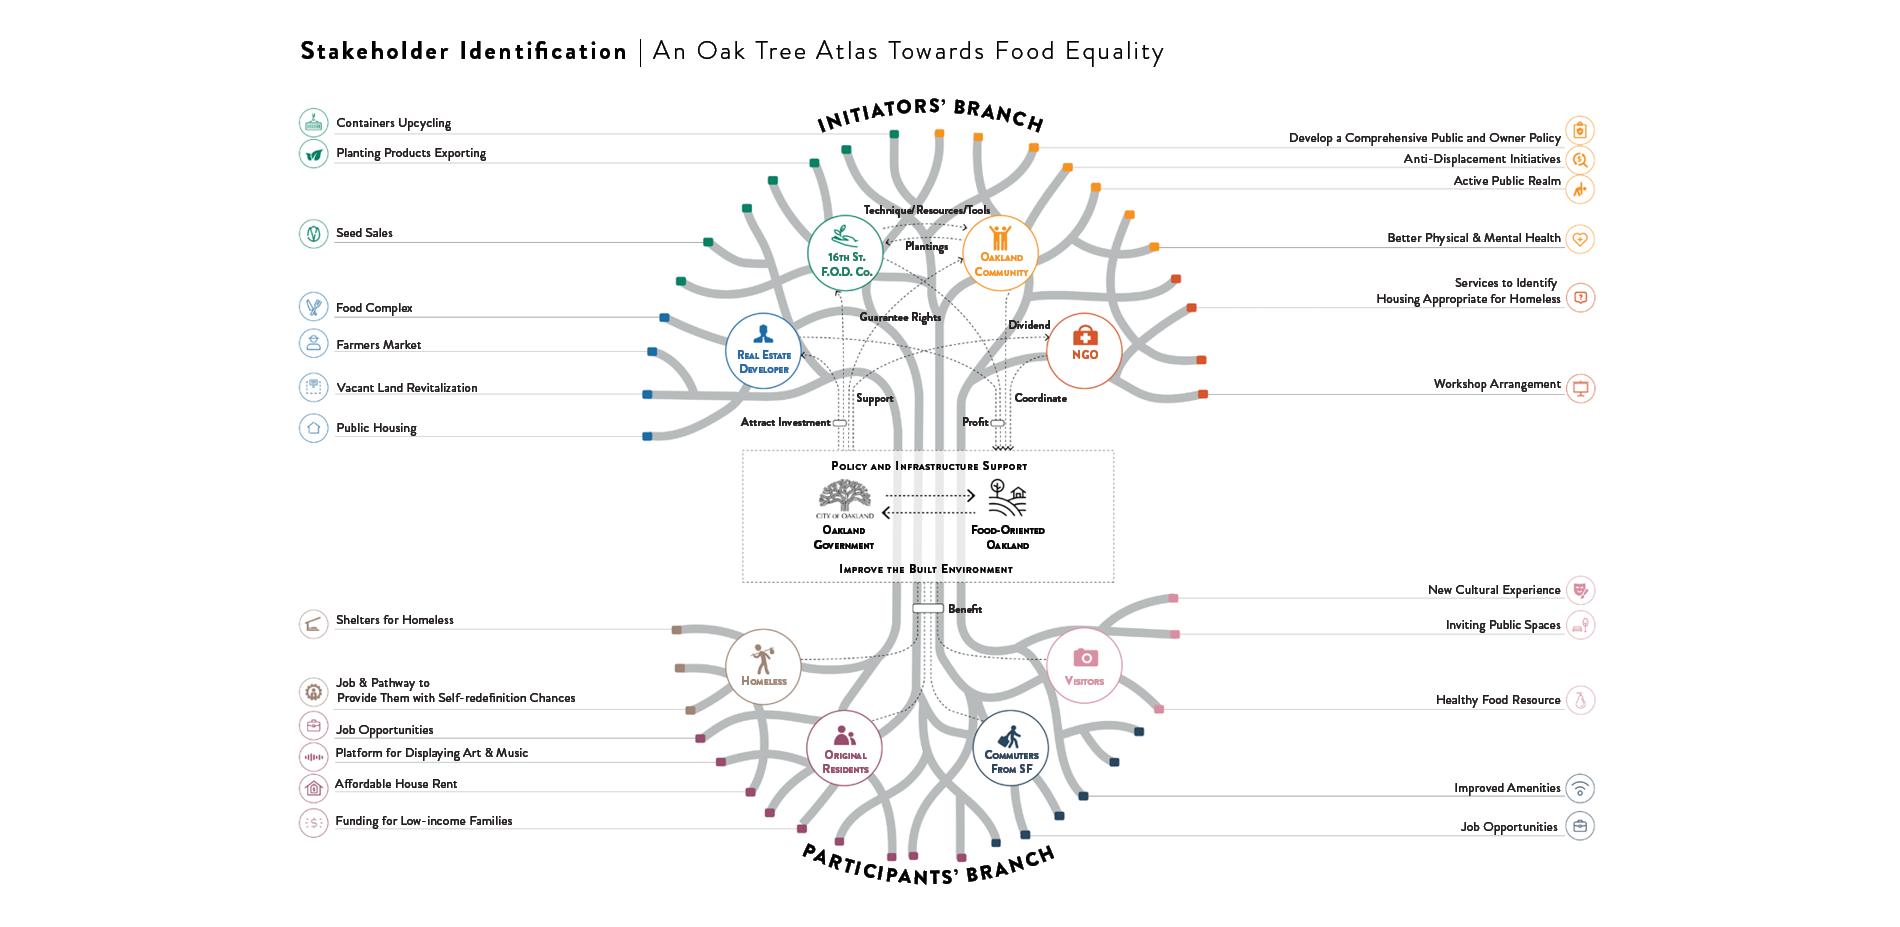 Stakeholder Identification | An Oak Tree Atlas Towards Food Equality